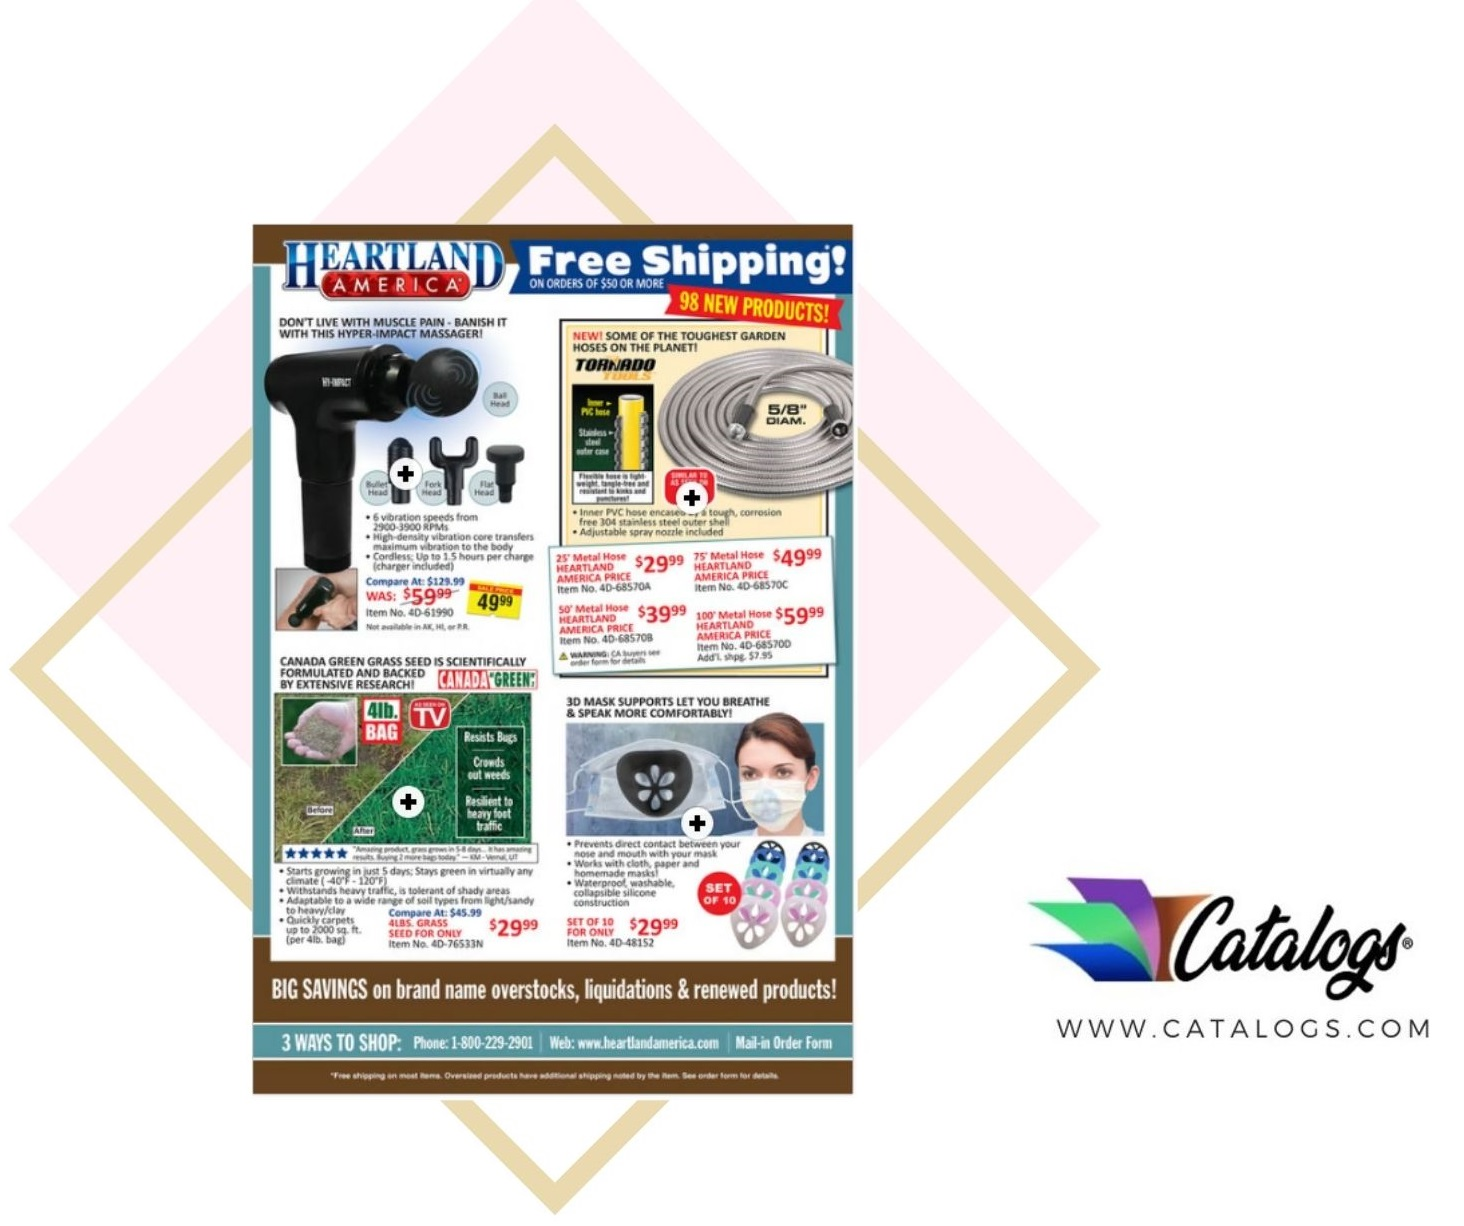 How Do I Order a Free Heartland America Kitchen and Houseware Catalog?